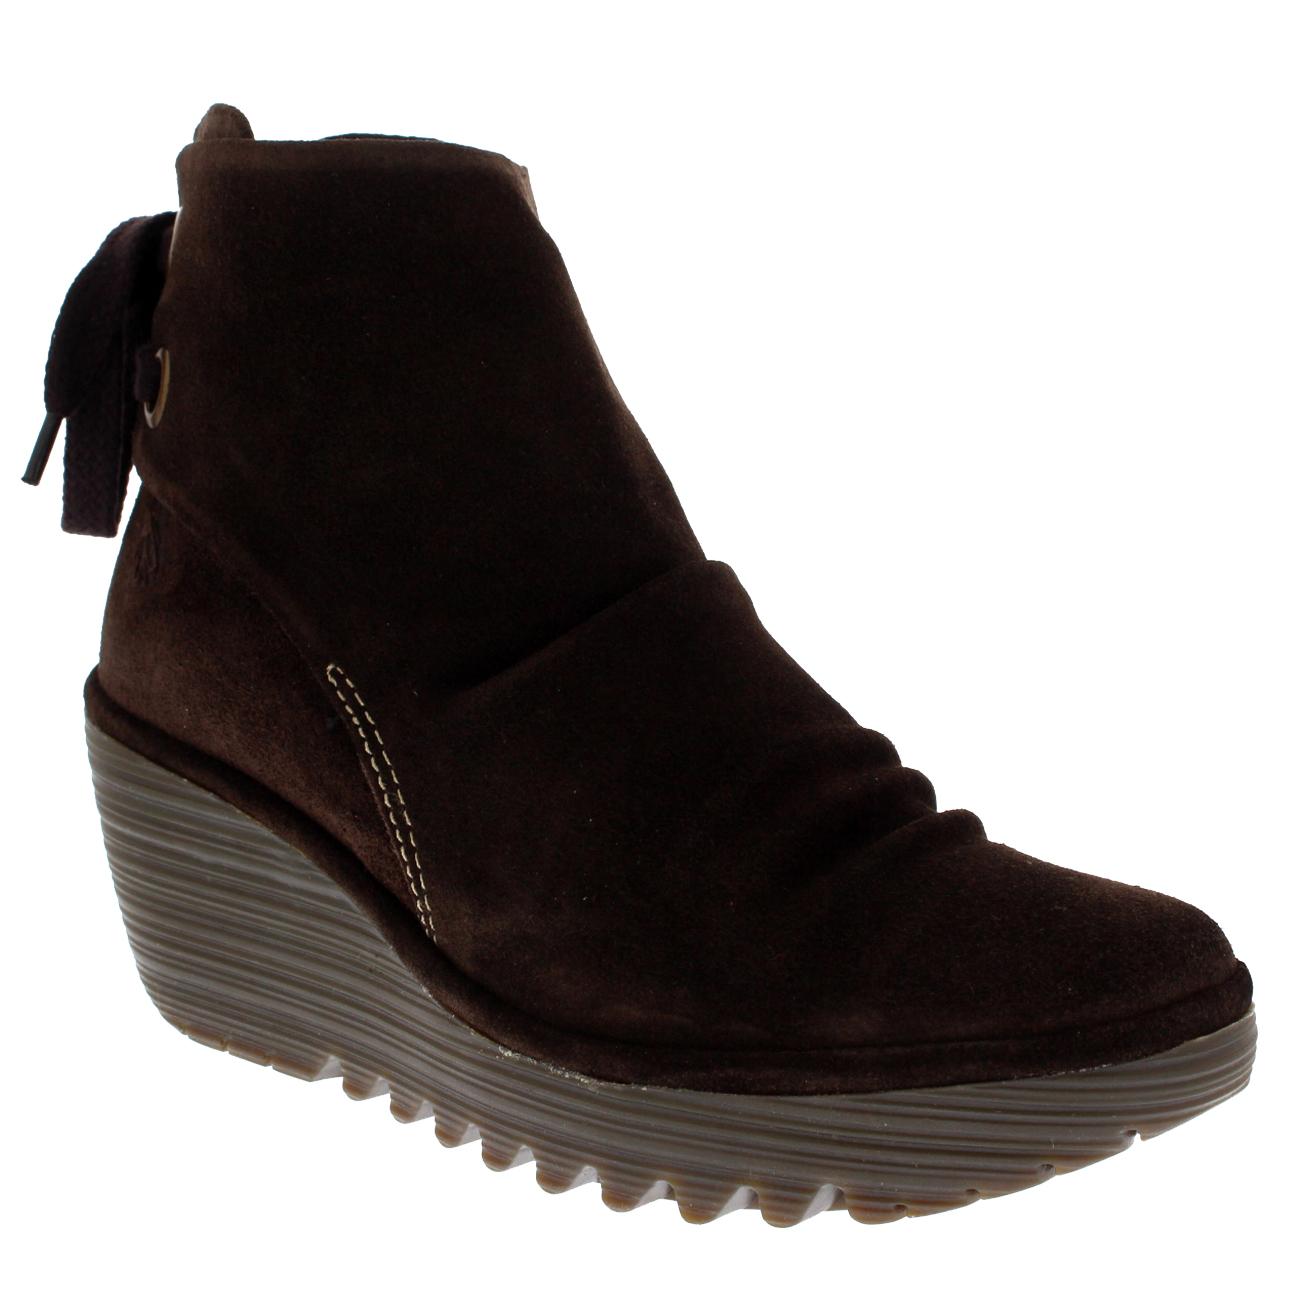 Fly London Yama Slouch Lace Up Biker Fashion Ankle Boot Size 42 8 uk women lady